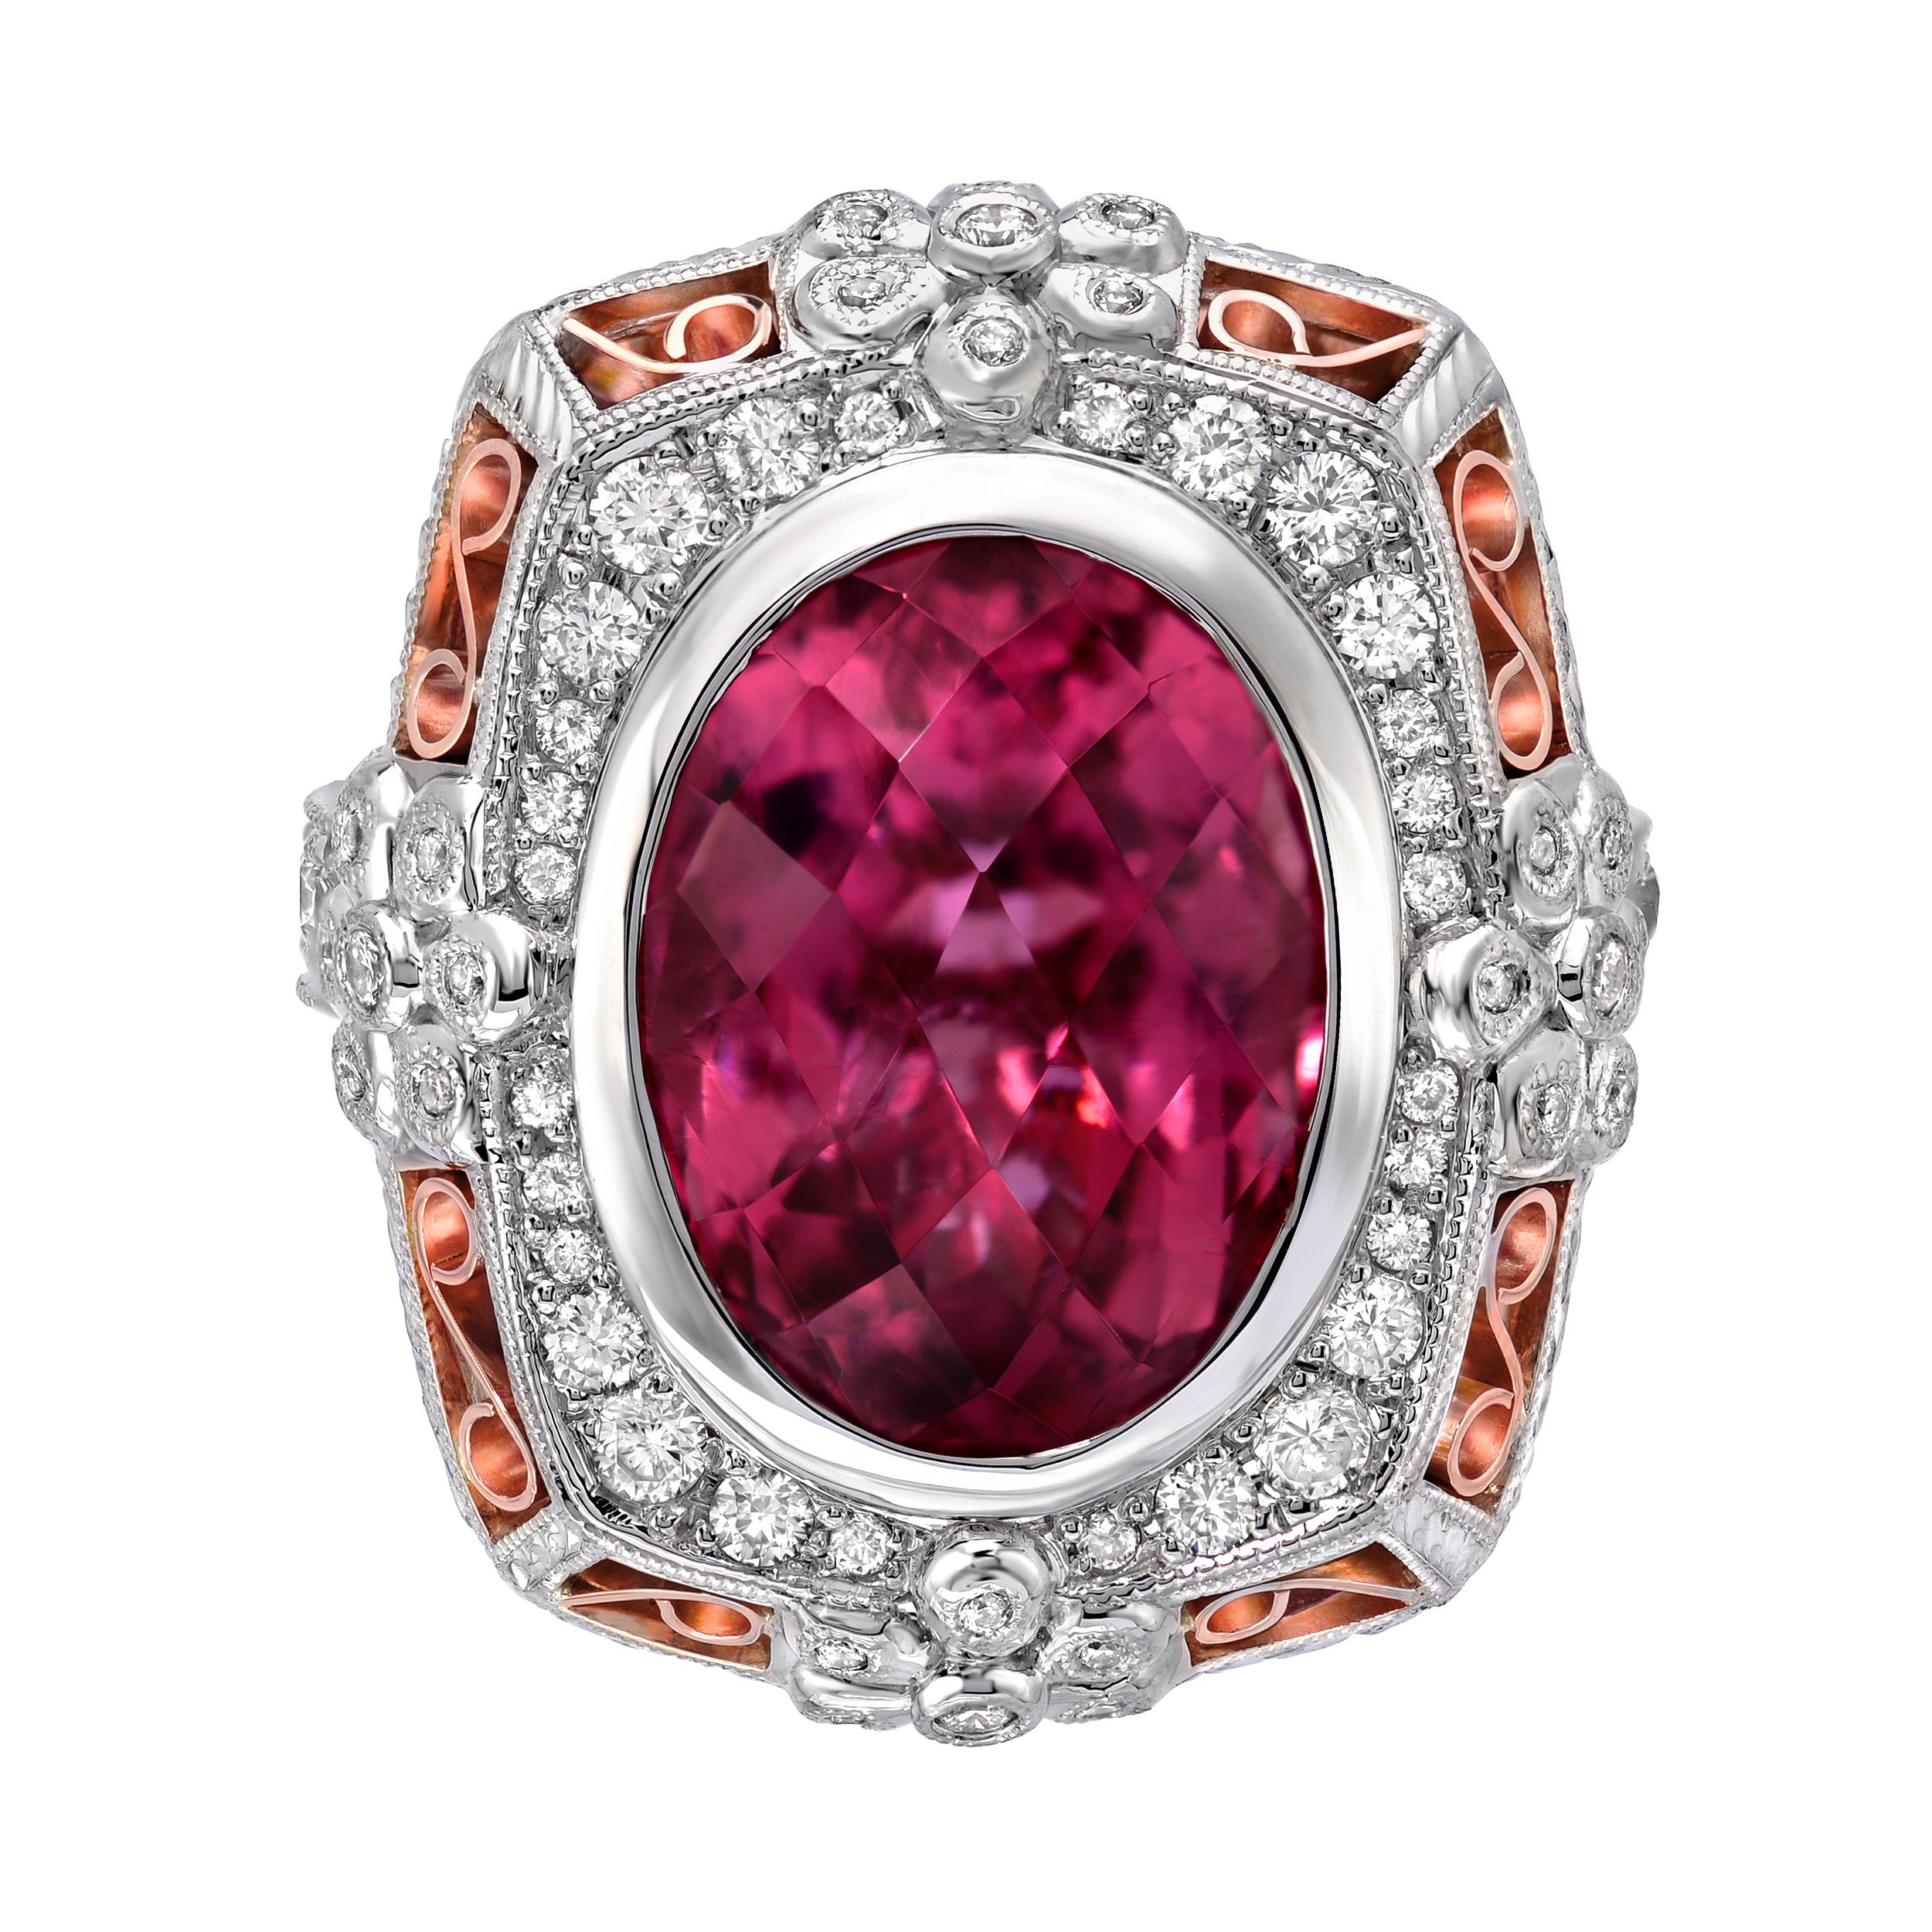 Fiorellino Pink Rubellite Diamond Ring (1).jpg